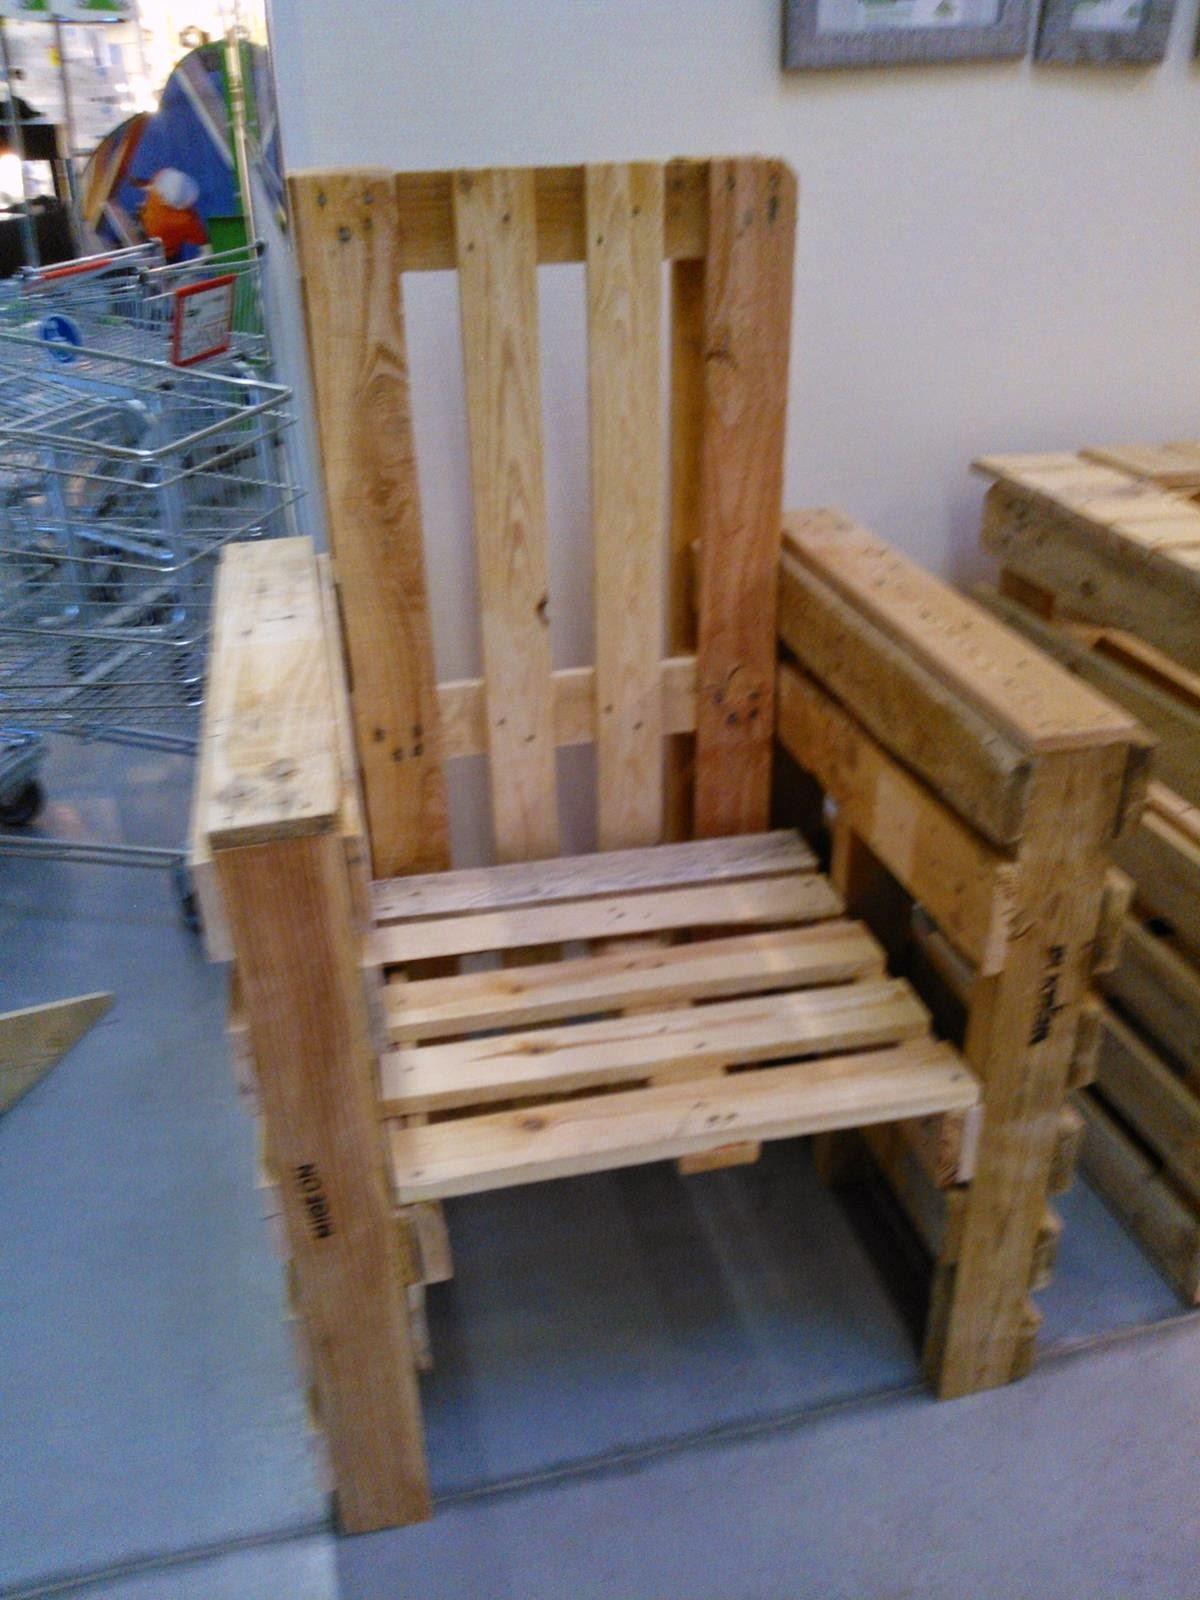 cours de recyclage palettes cr ation. Black Bedroom Furniture Sets. Home Design Ideas